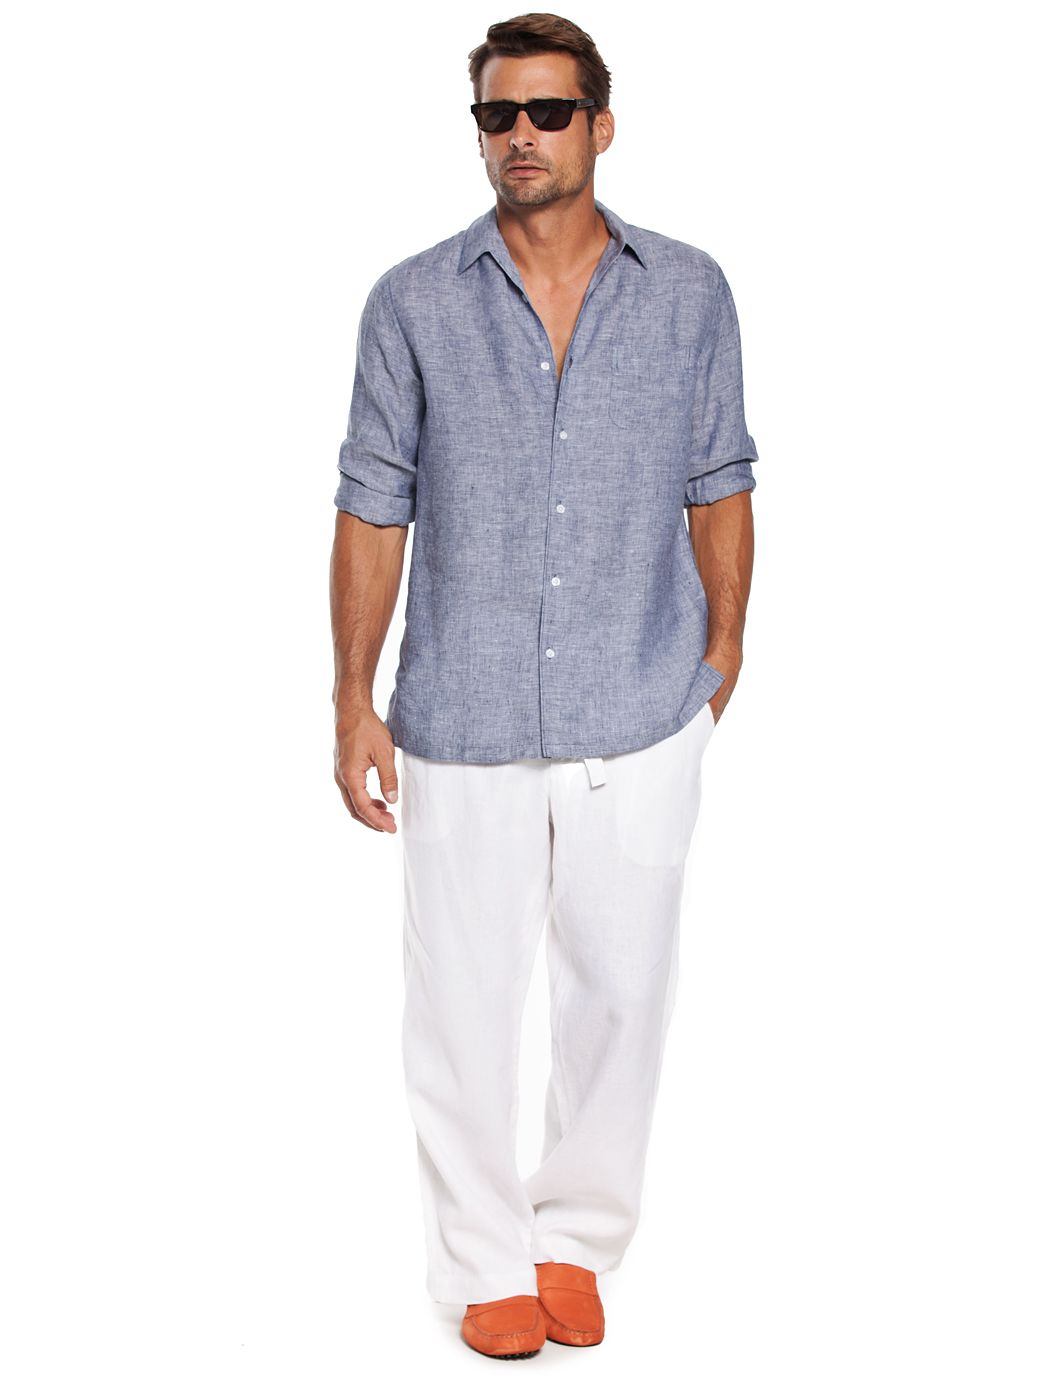 Mens White Linen Beach Pants Jef Pinterest Linen Pants Mens